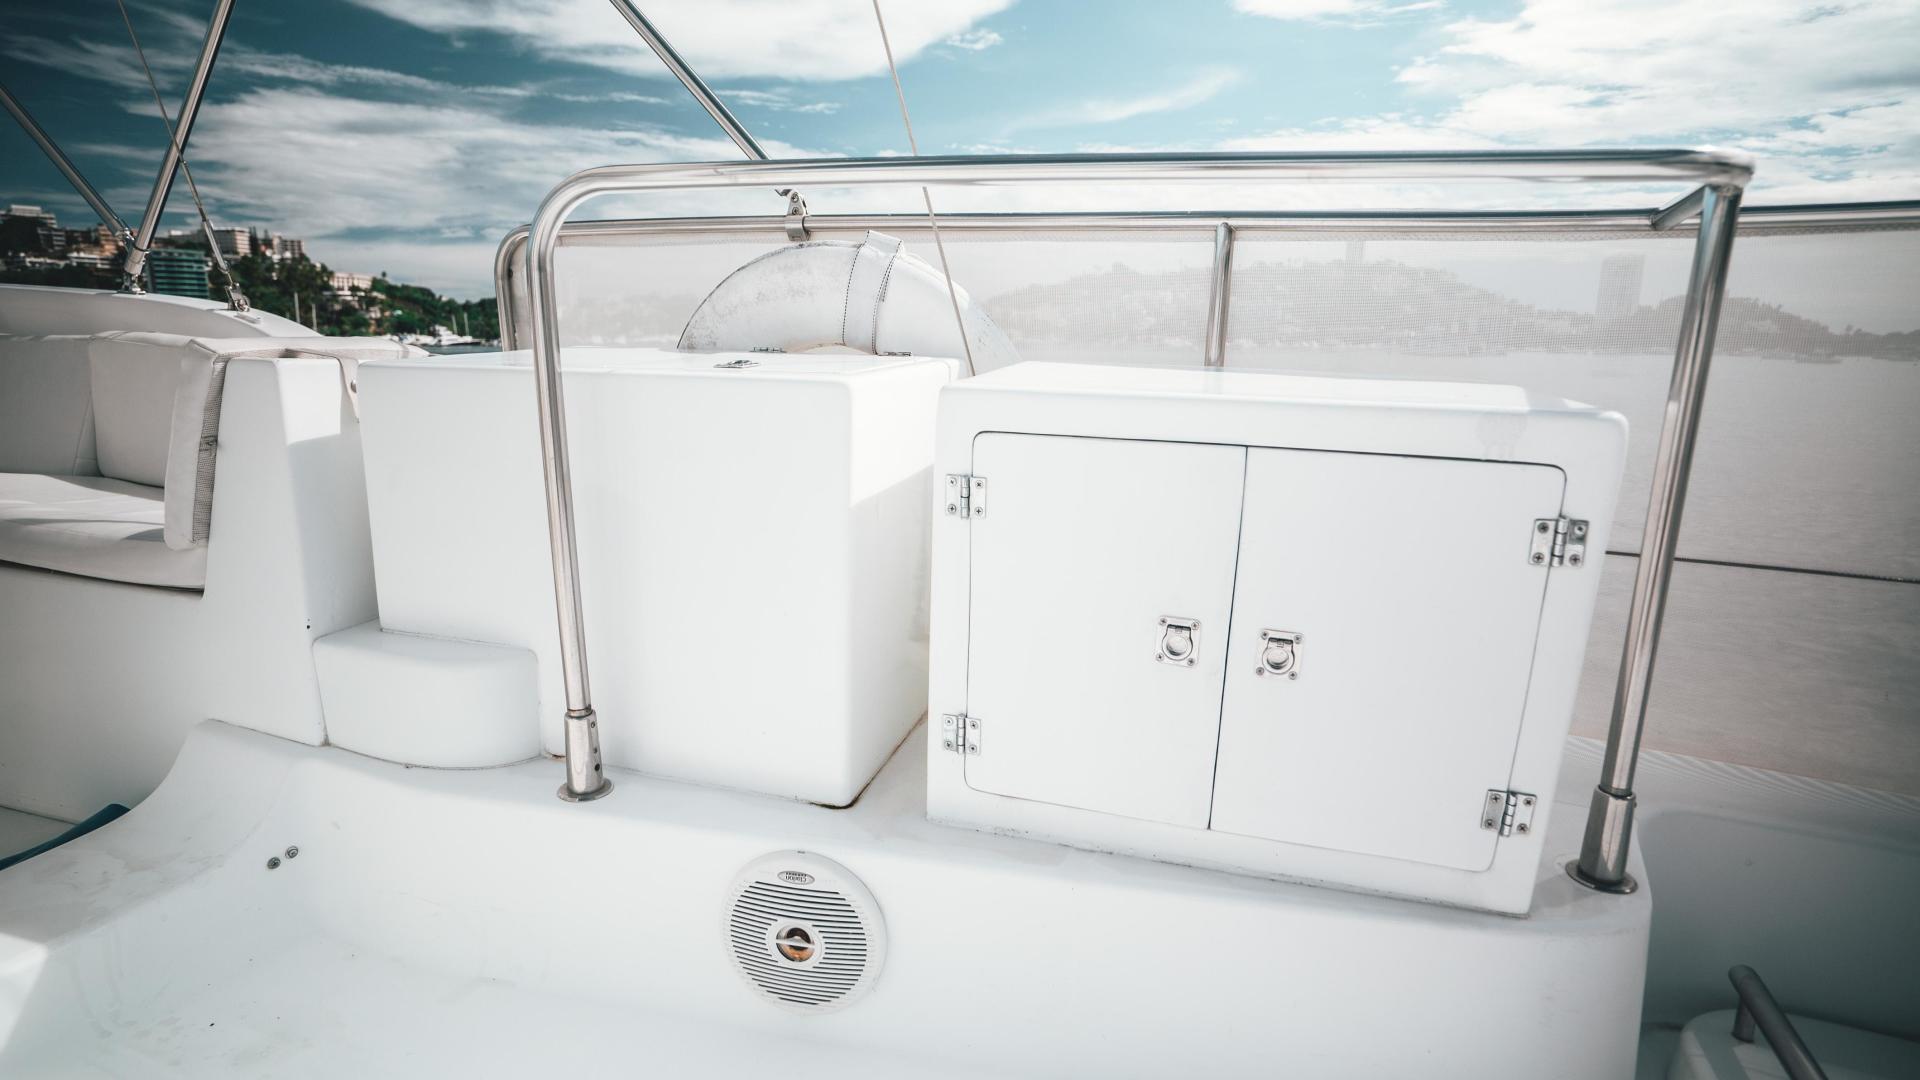 Beneteau-Swift Trawler 2008-Amadeus Acapulco-Mexico-1487045 | Thumbnail